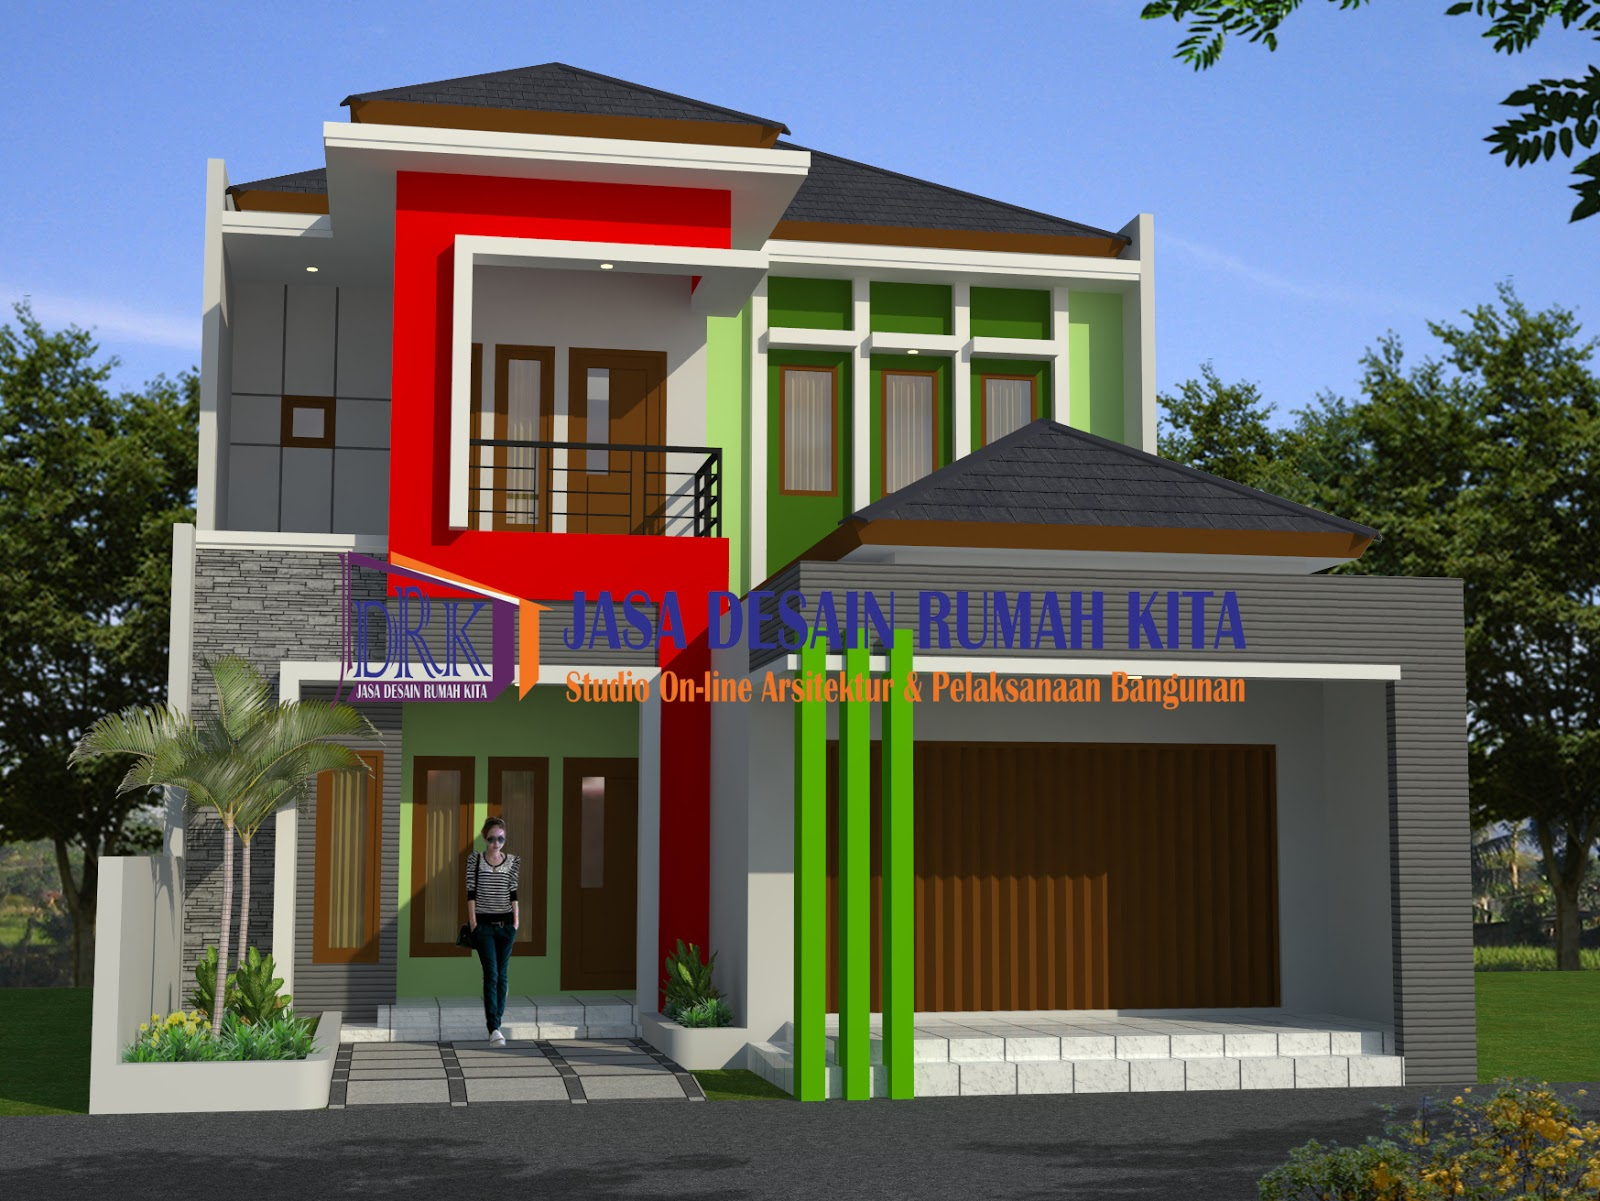 105 Gambar Arsitektur Rumah Minimalis 2 Lantai | Gambar ...